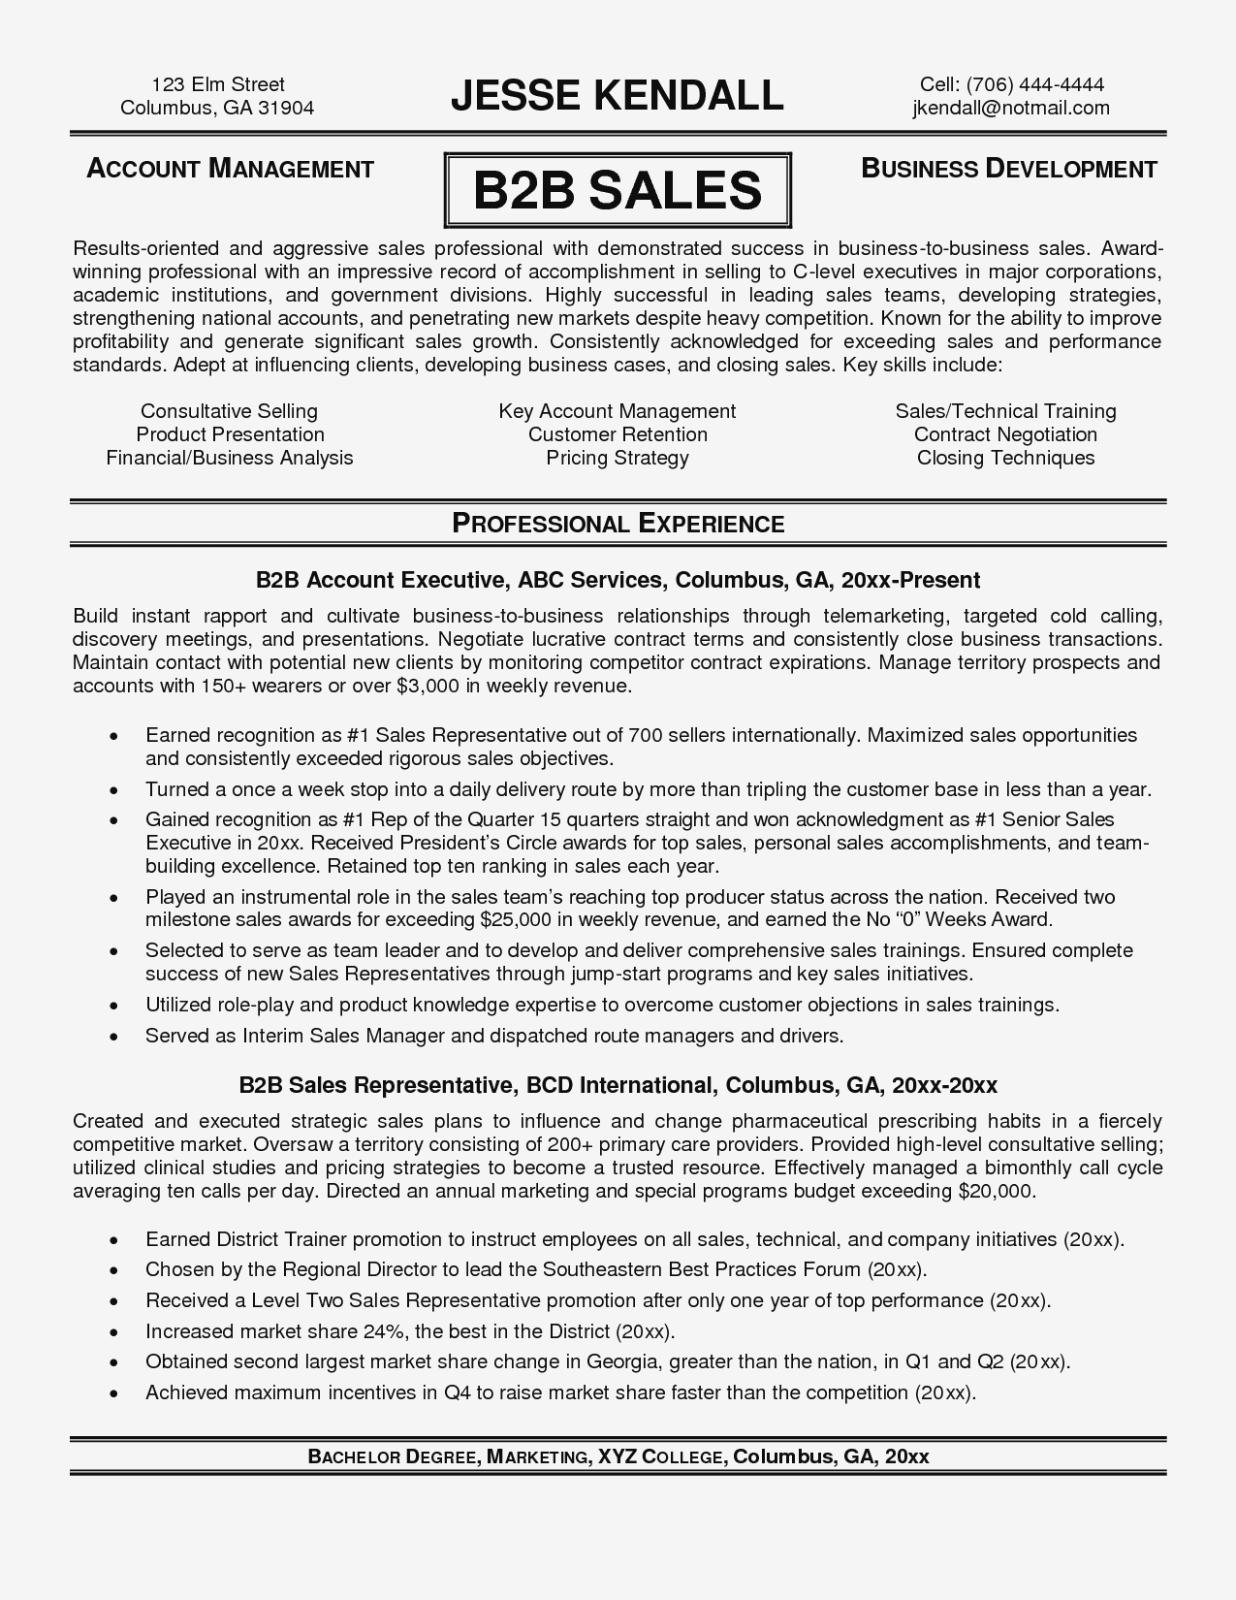 sales resume example, sales resume examples, sales resume examples 2019, sales resume examples 2017, sales resume examples with numbers, sales resume examples pdf, sales resume examples 2018, sales resume examples no experience,